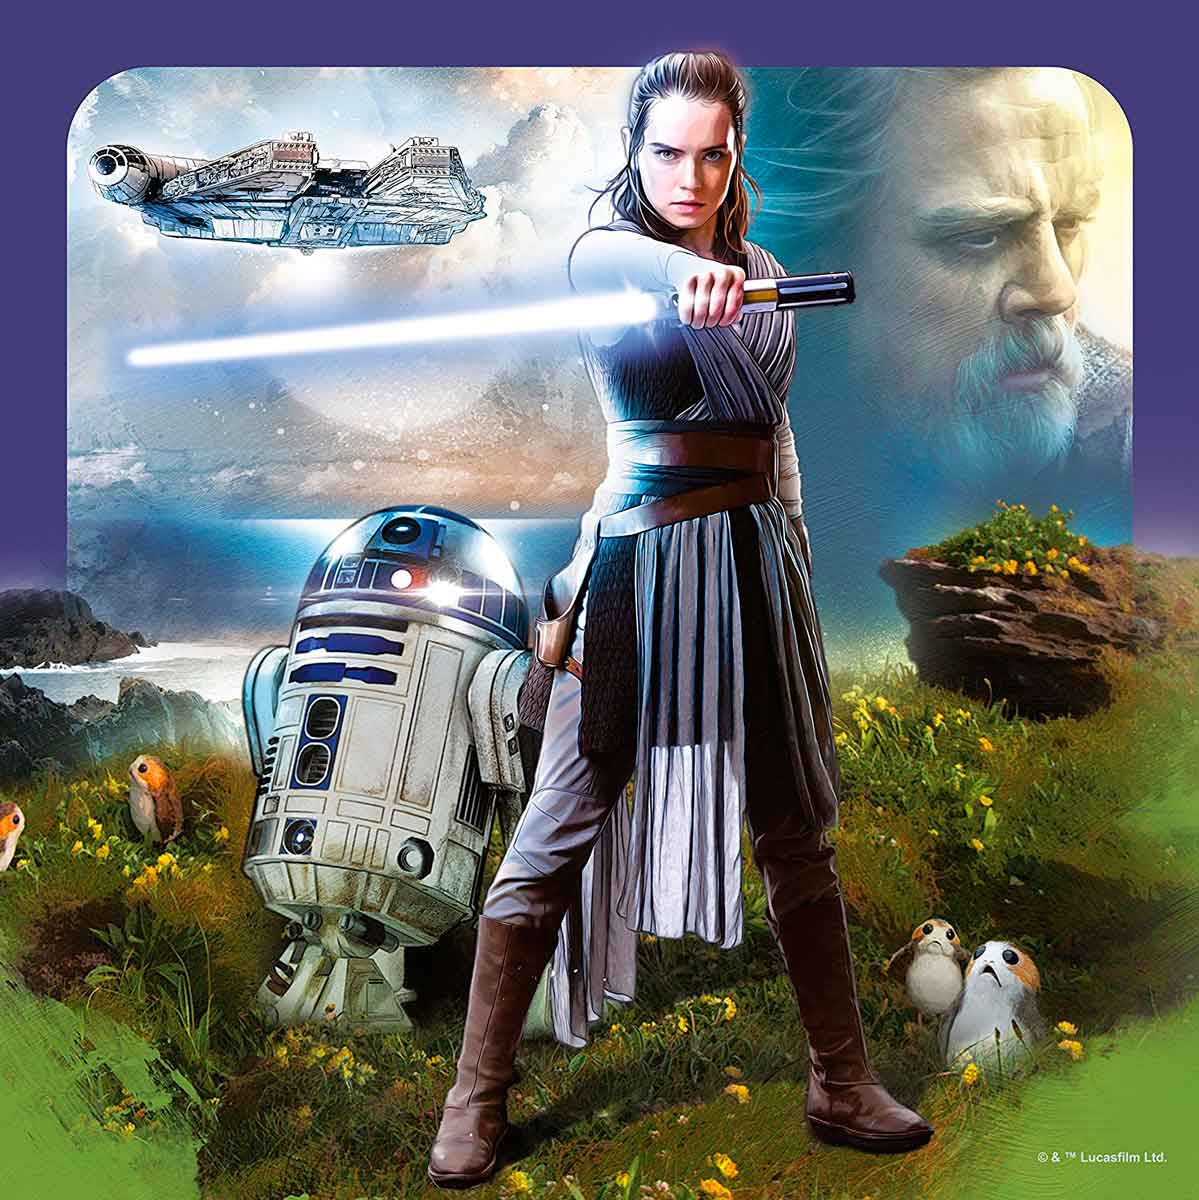 Puzzle Ravensburger Star Wars Episodio VIII, de 3x49 Piezas